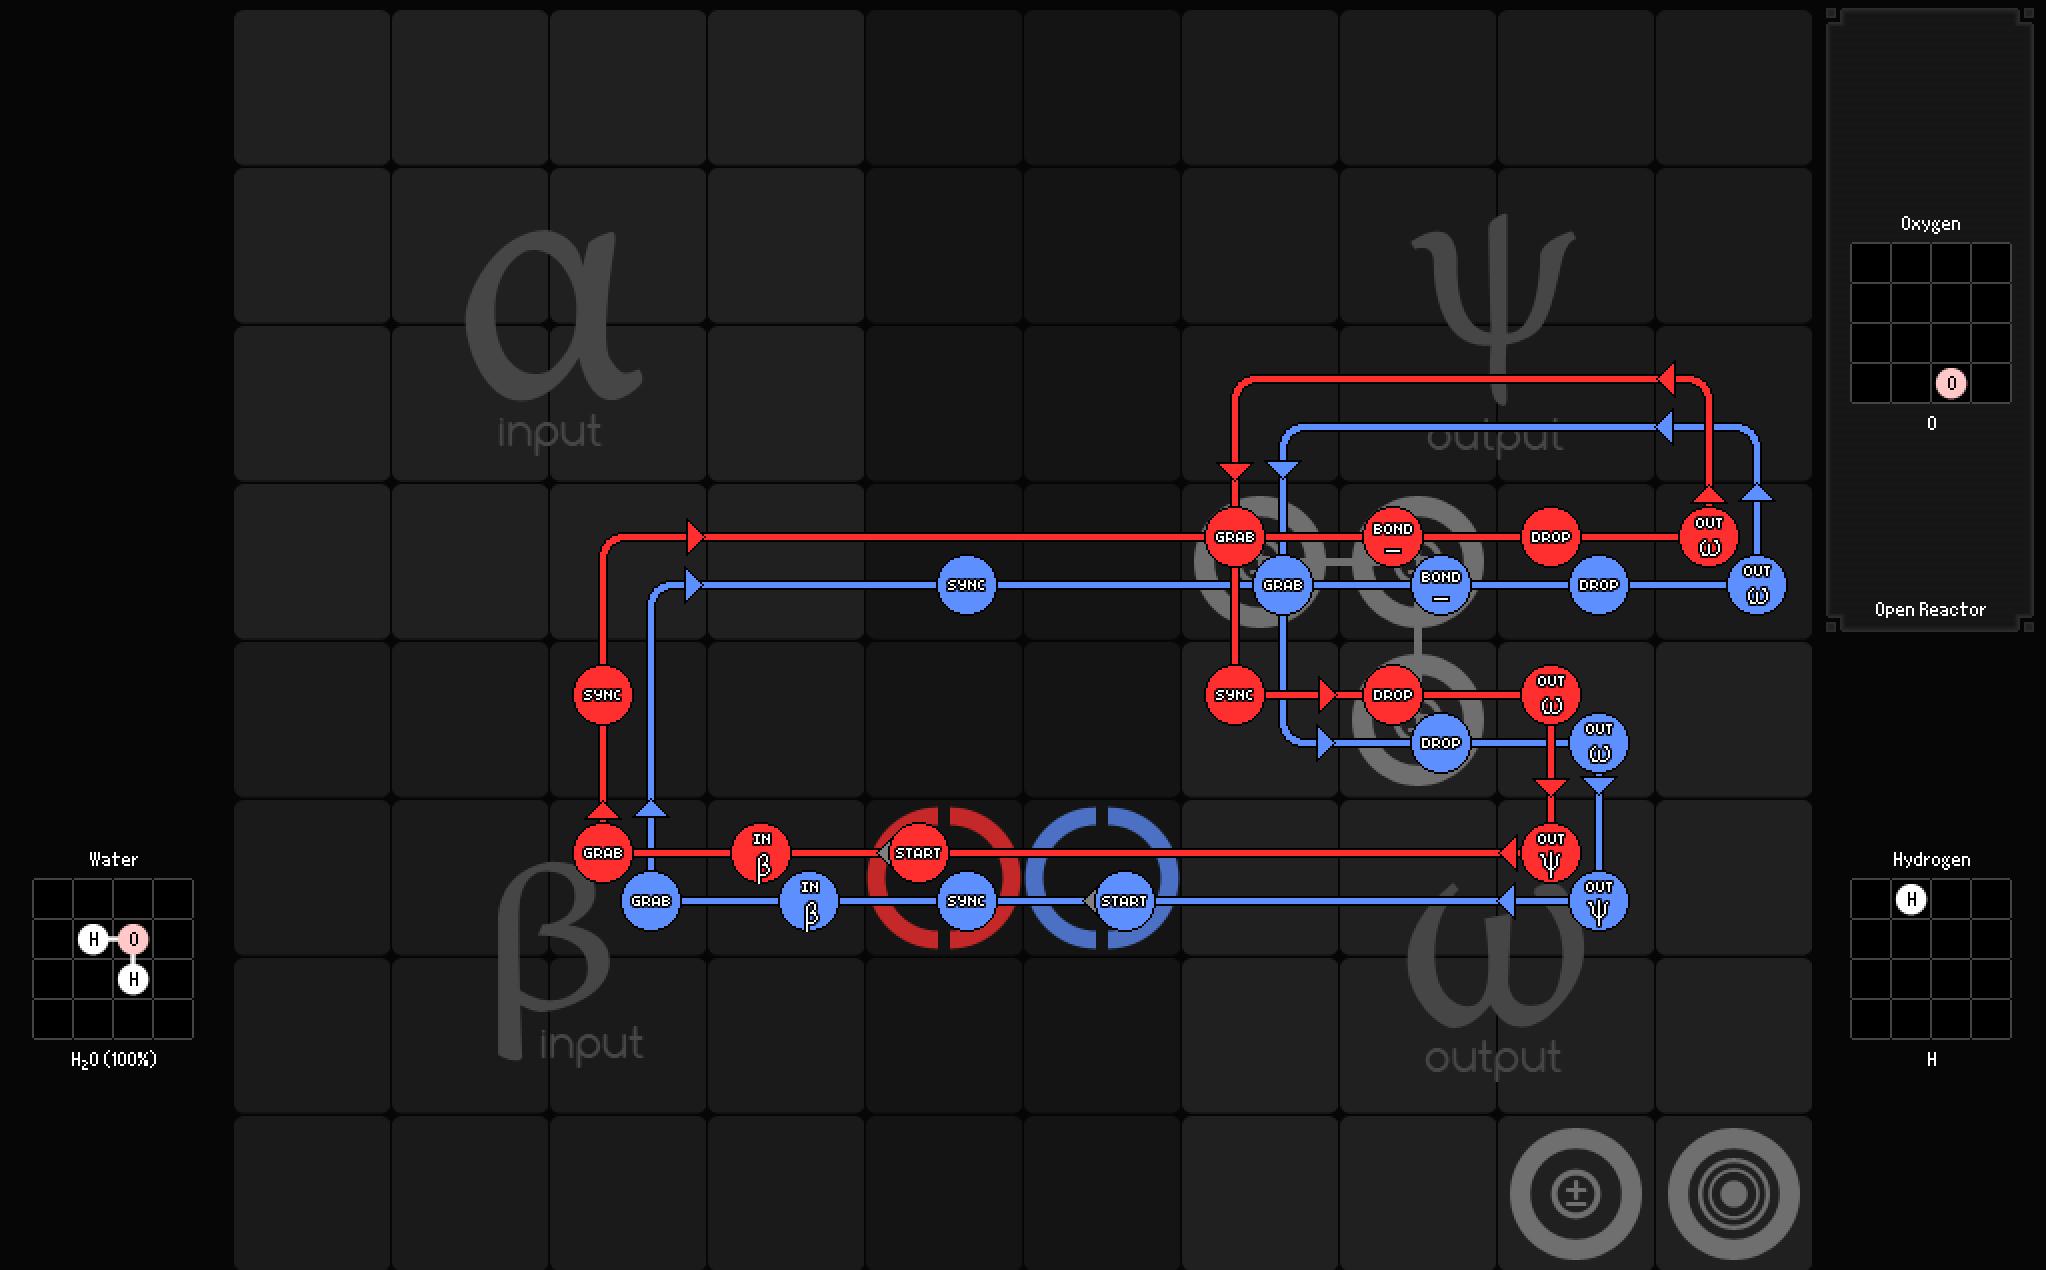 1_Story_Mode/5_Sikutar/SpaceChem-5.6.a-boss/Reactor_1.png